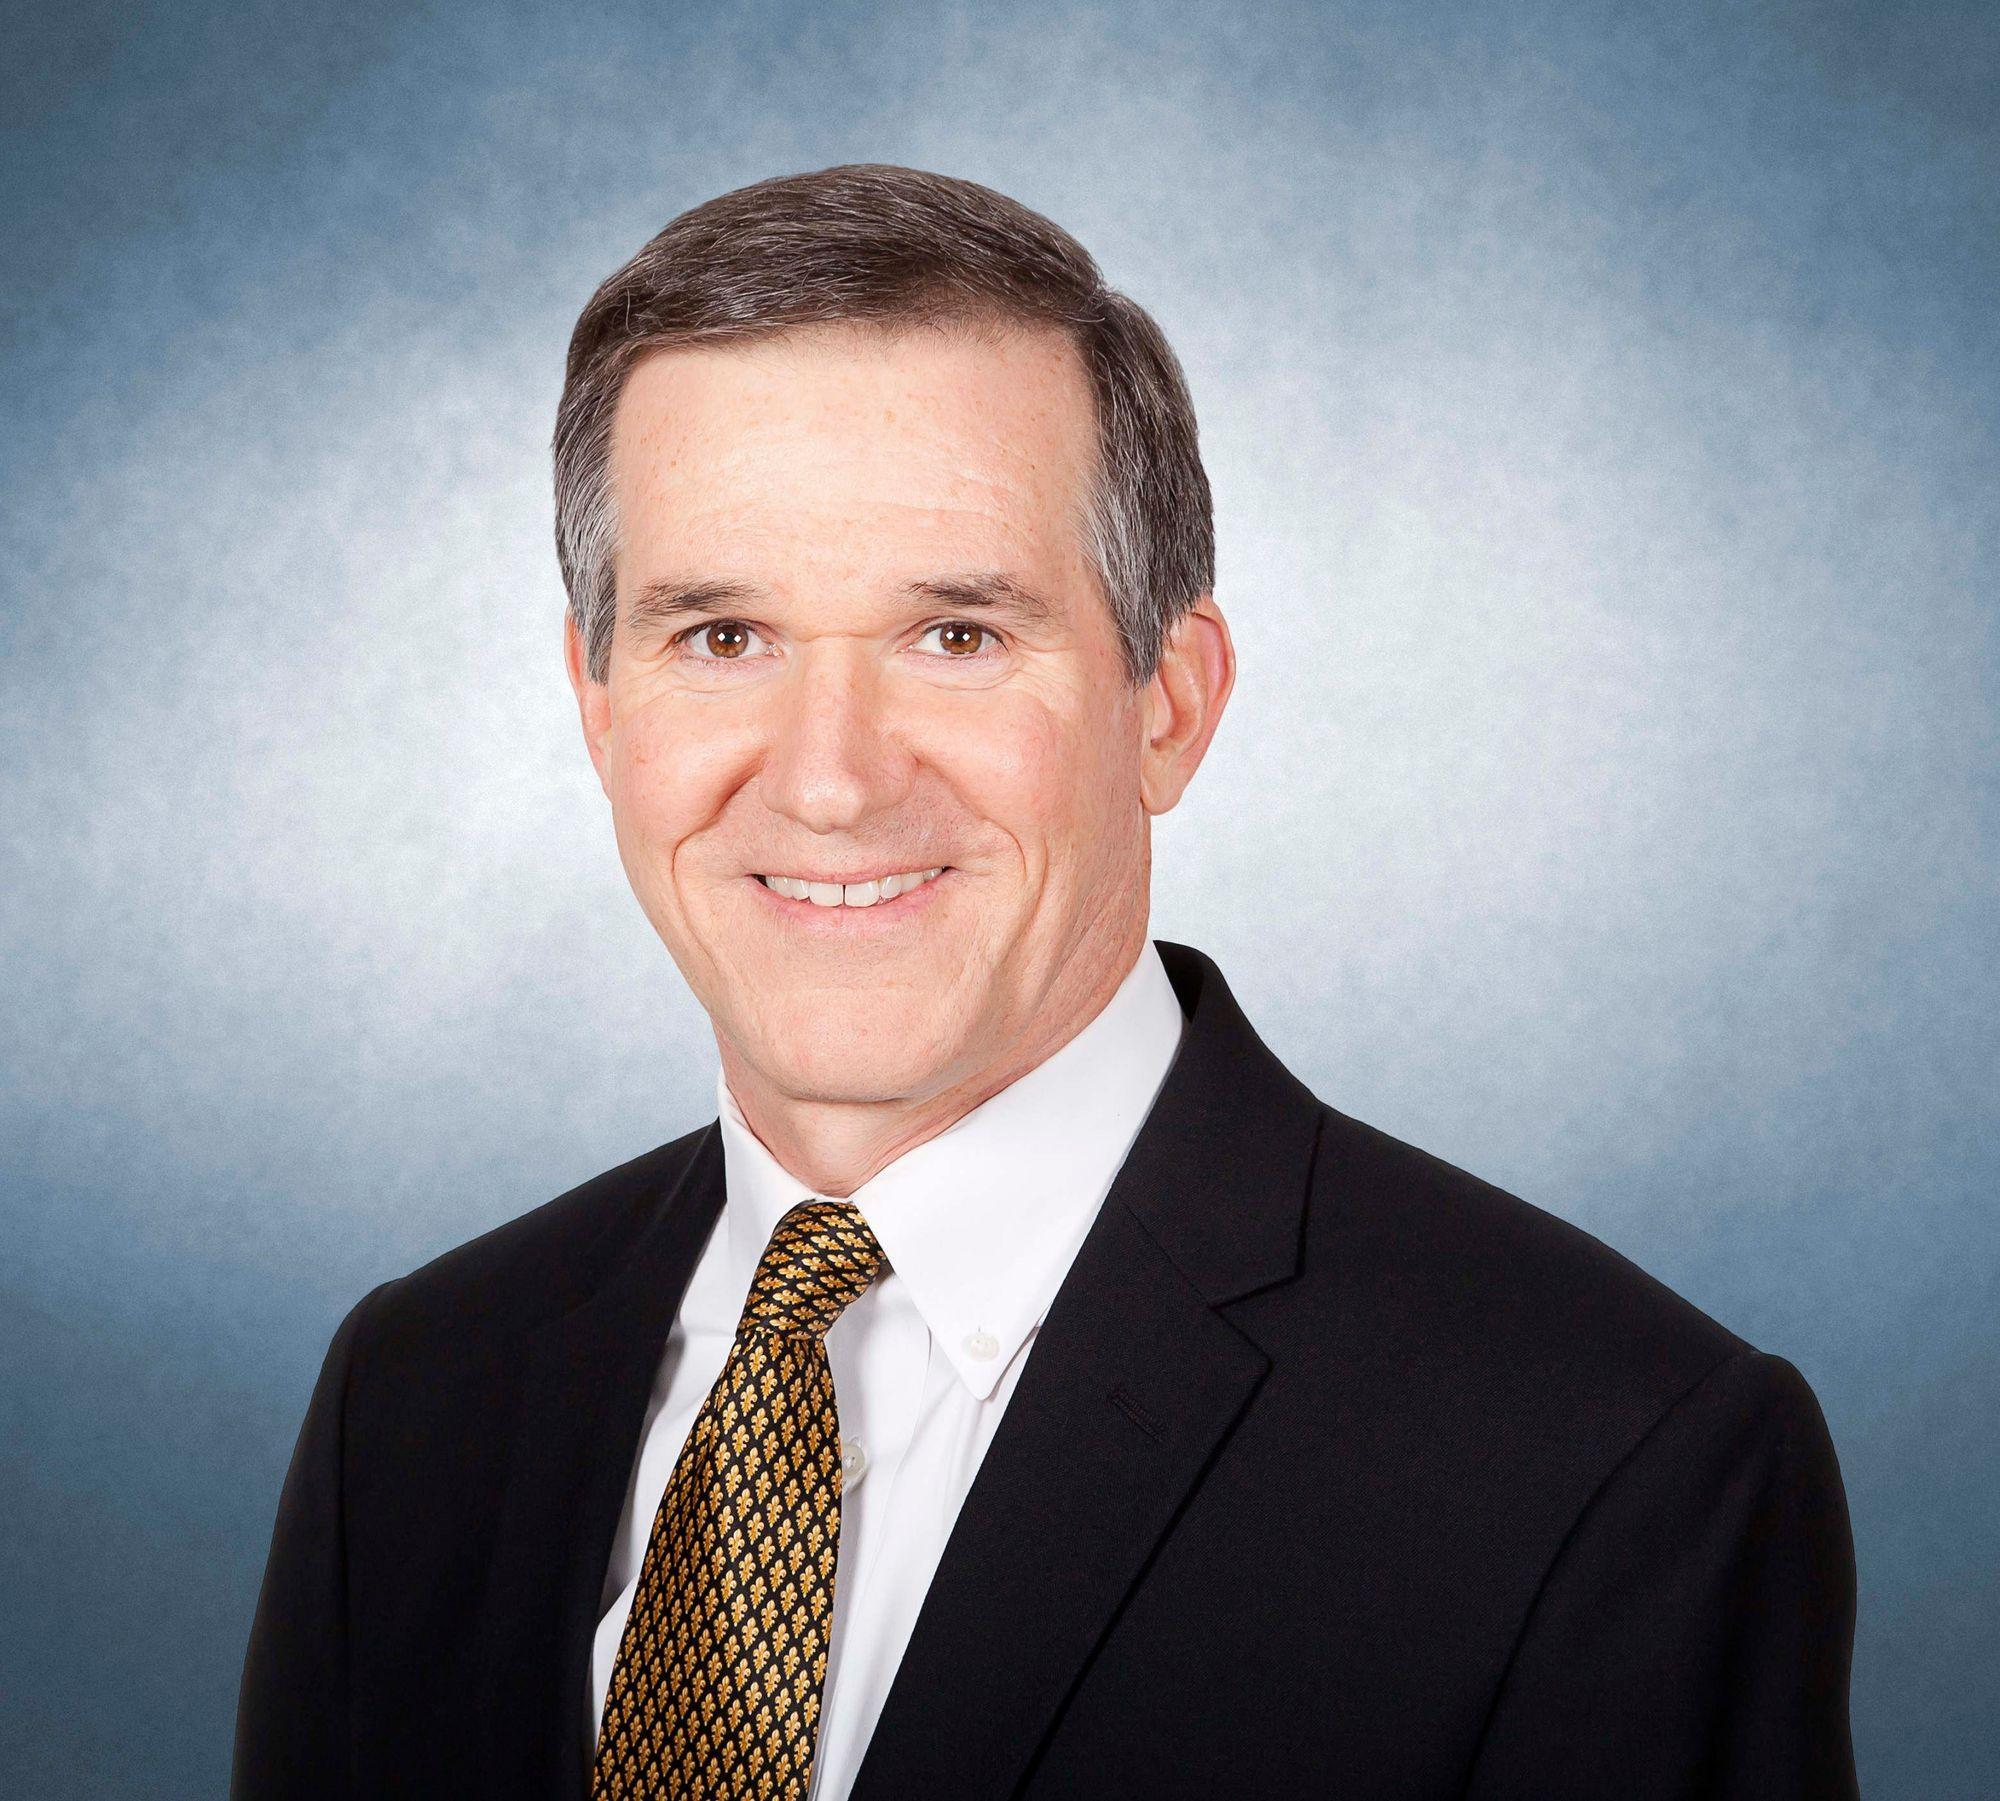 Mark Hatfield, future managing director Chevron Australia.